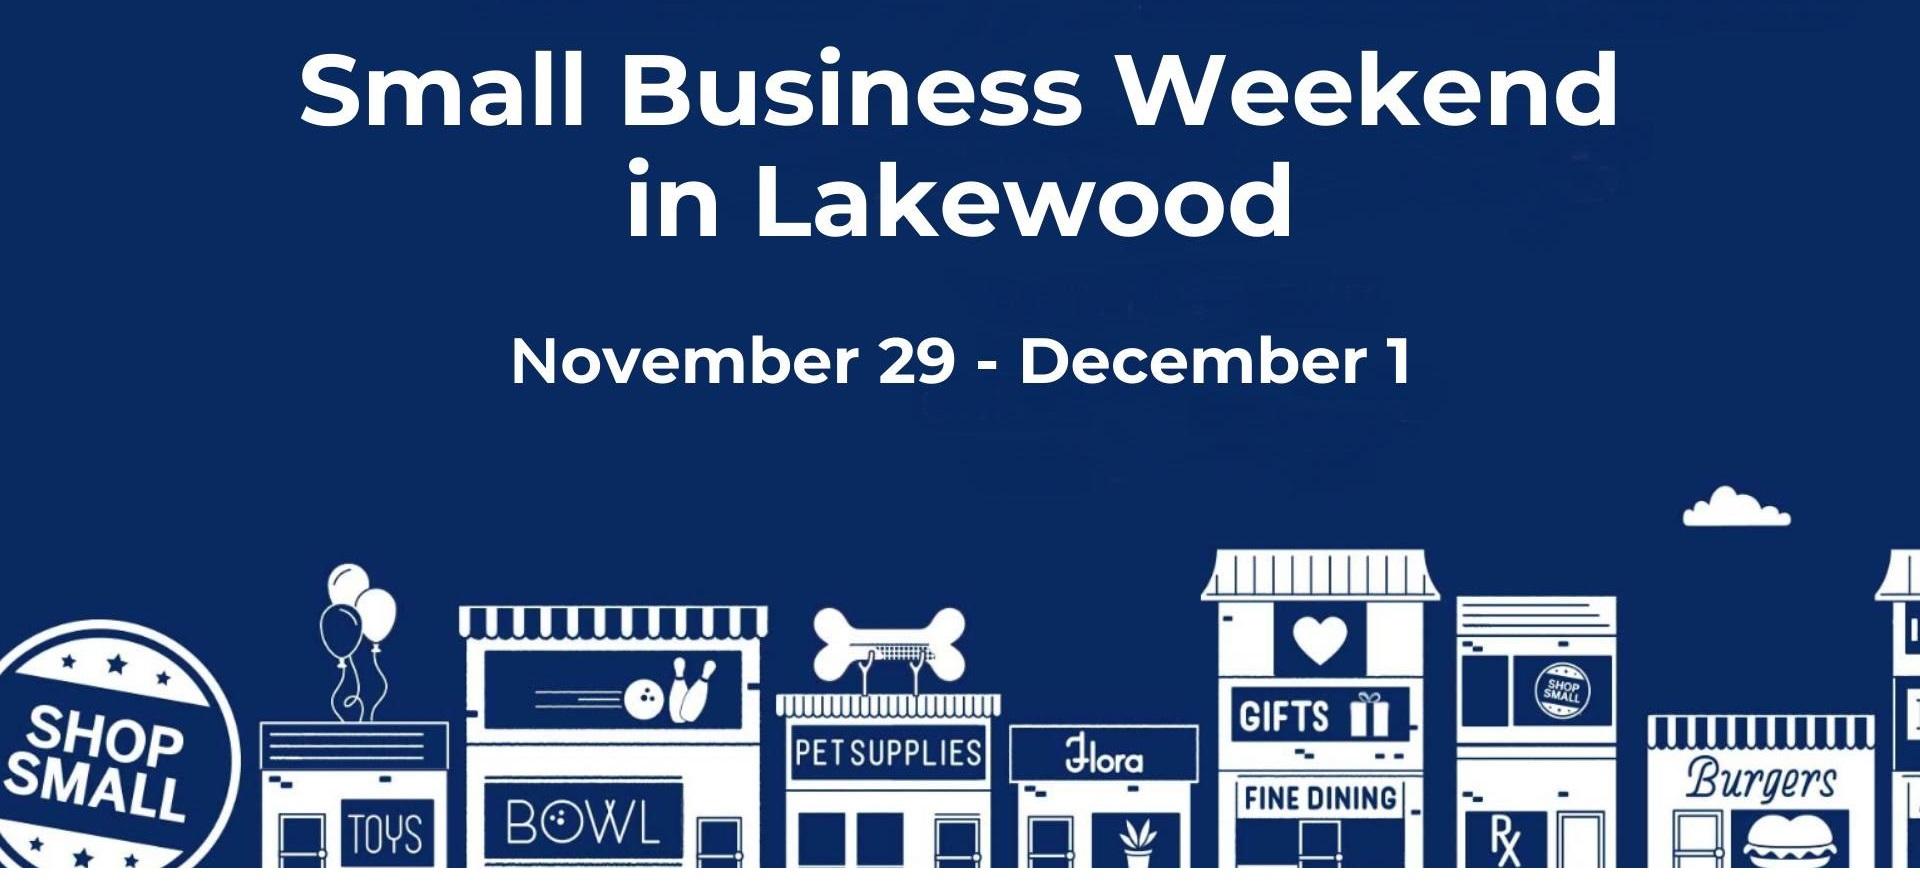 Lakewood Small Business